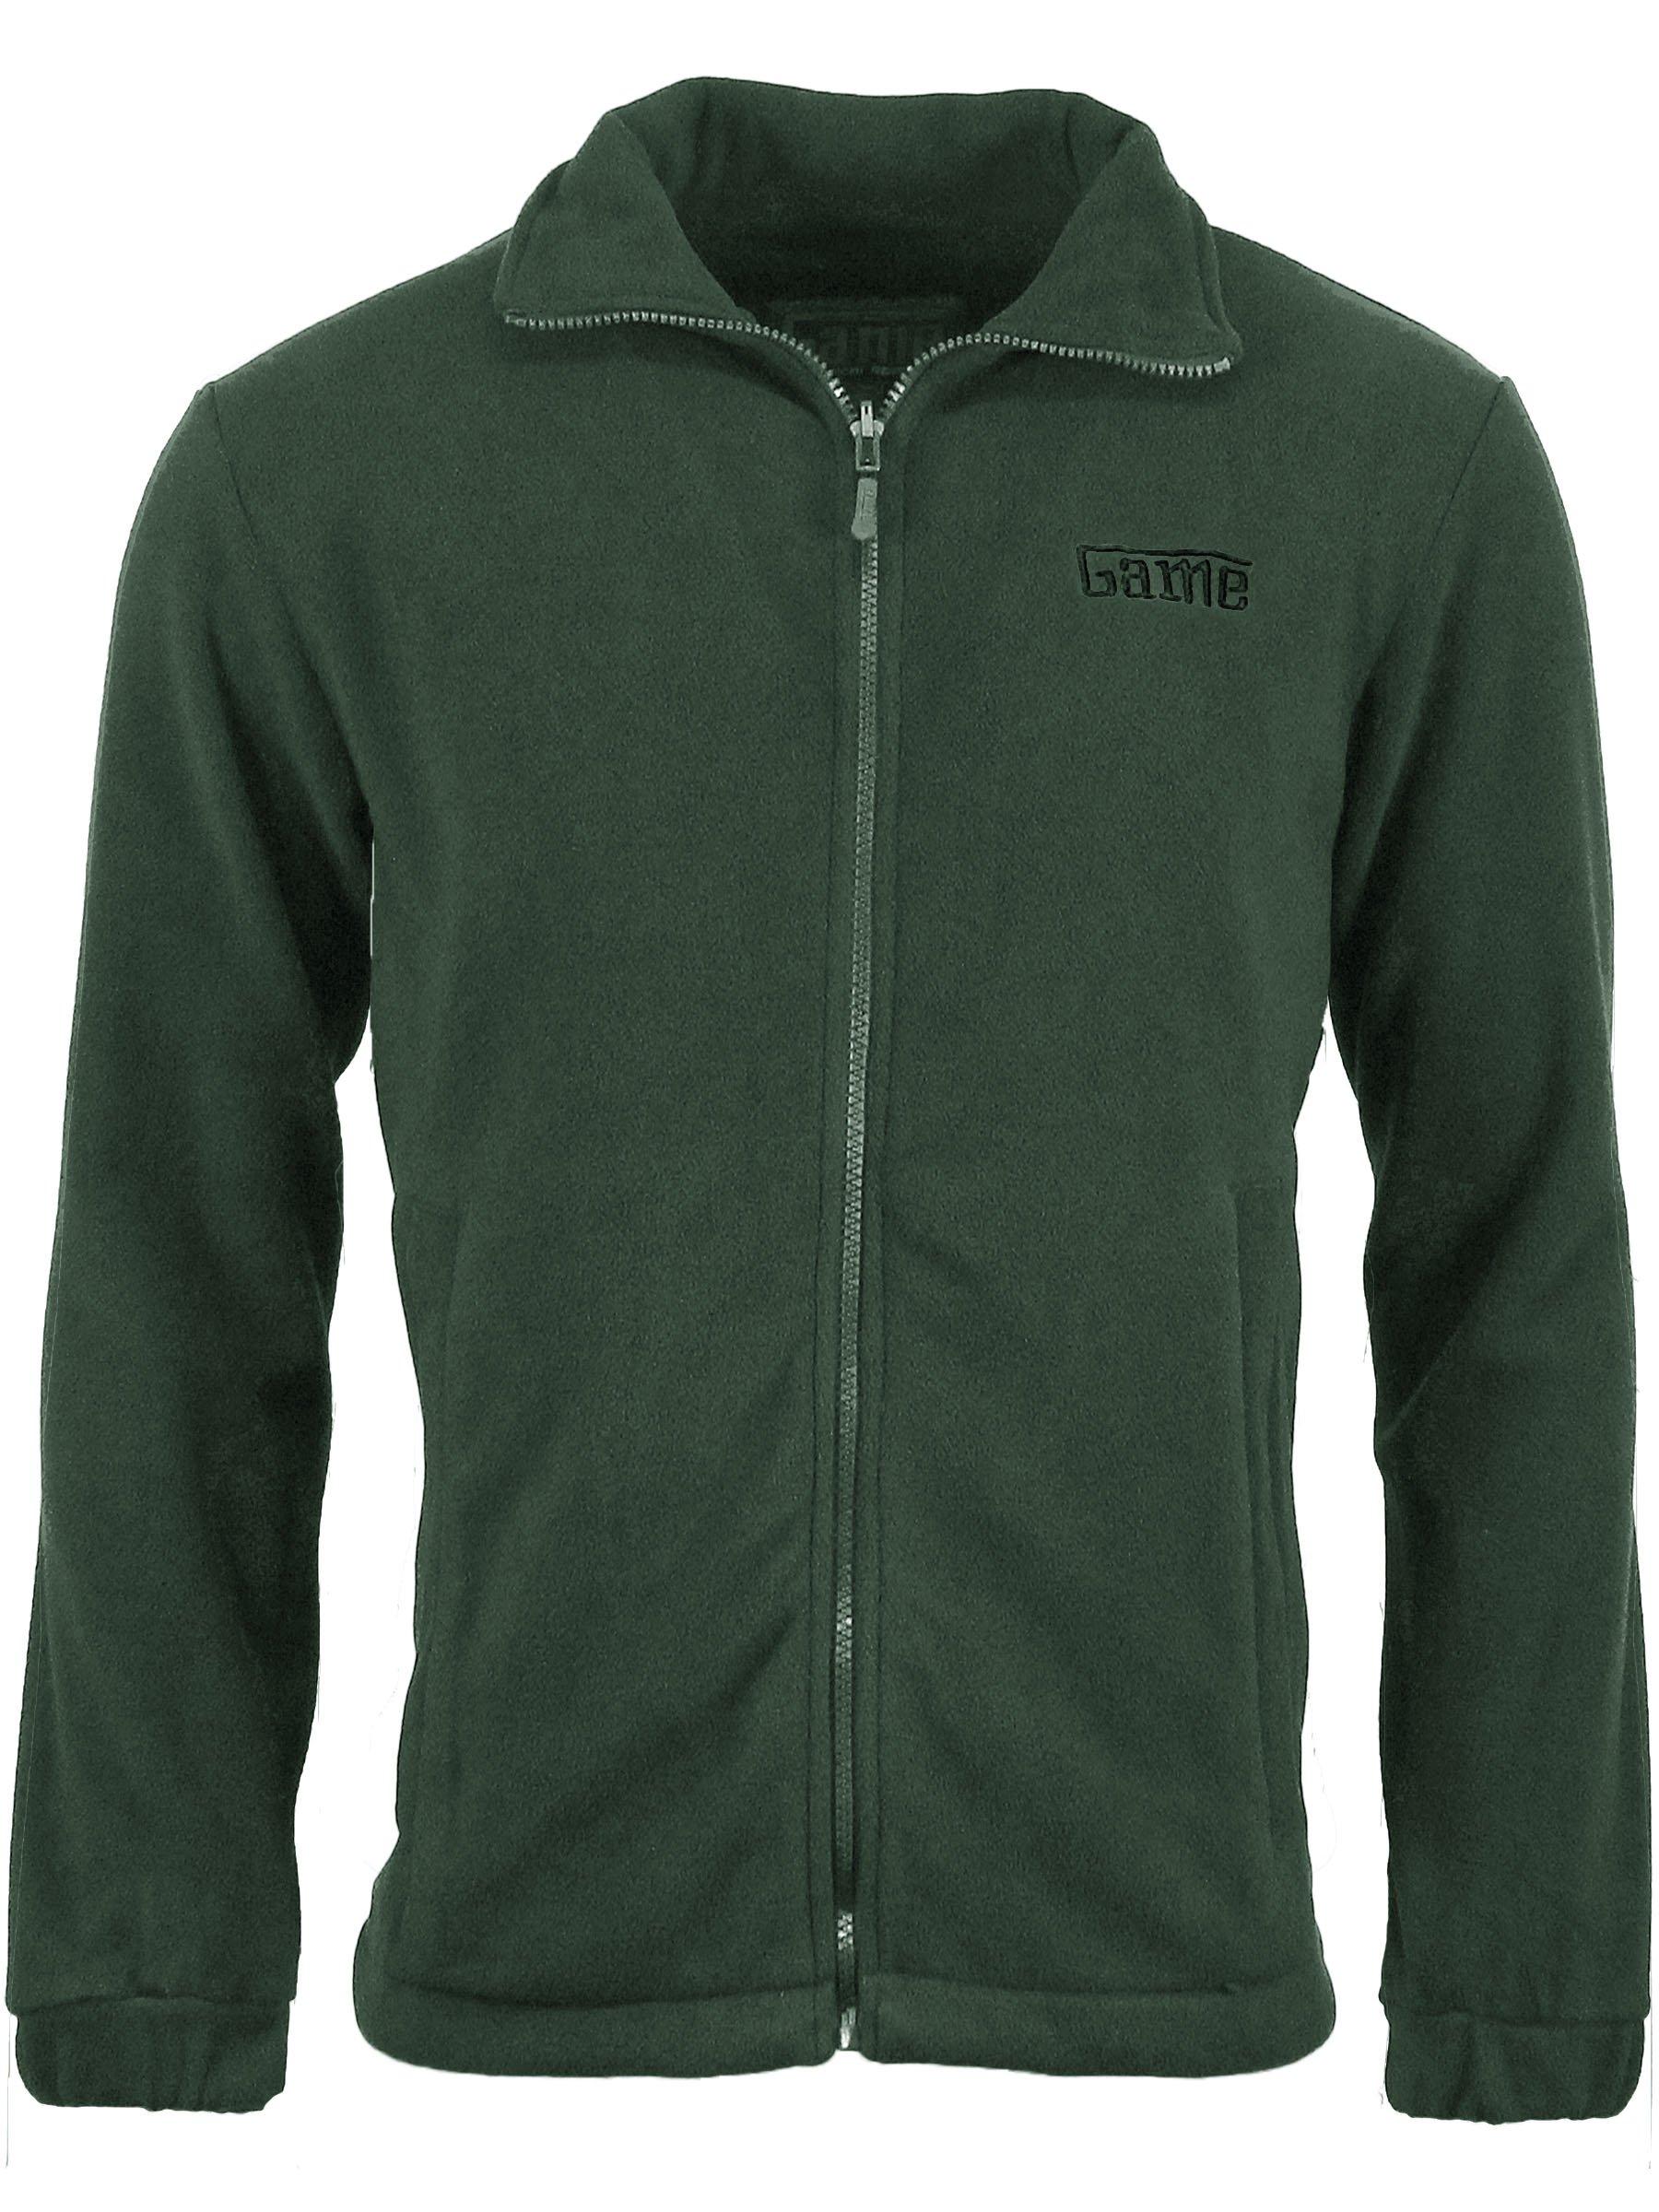 Game Technical Apparel Unisex Jacket Various Colours Stealth Fleece - Slate Grey S